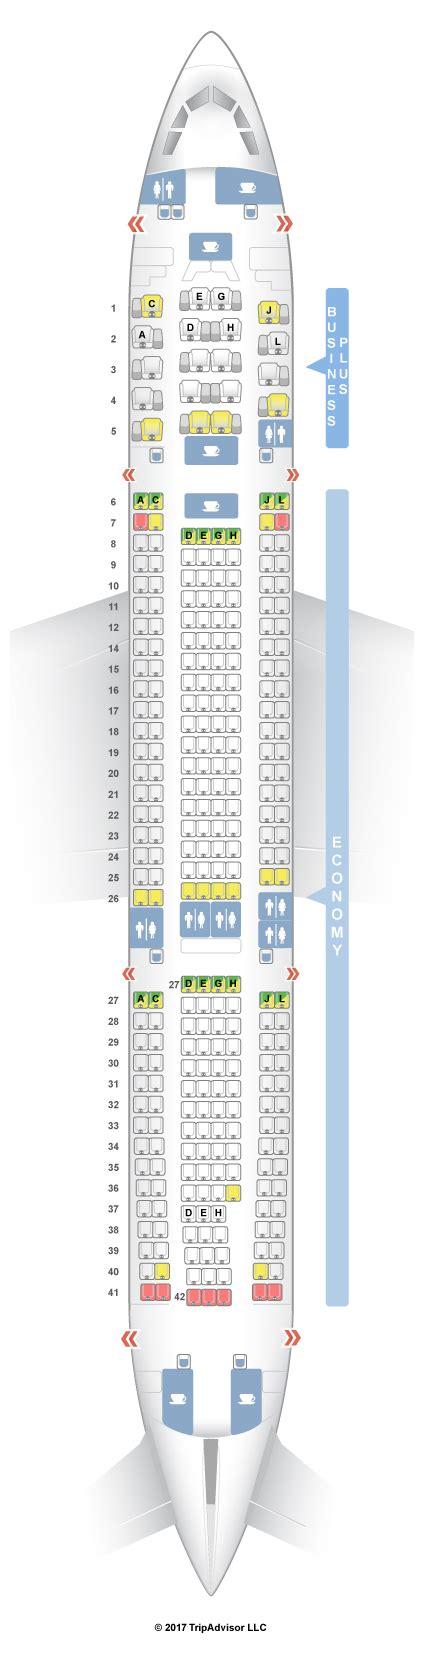 iberia airbus a340 500 seat map airbus a340 600 seat plan iberia brokeasshome com